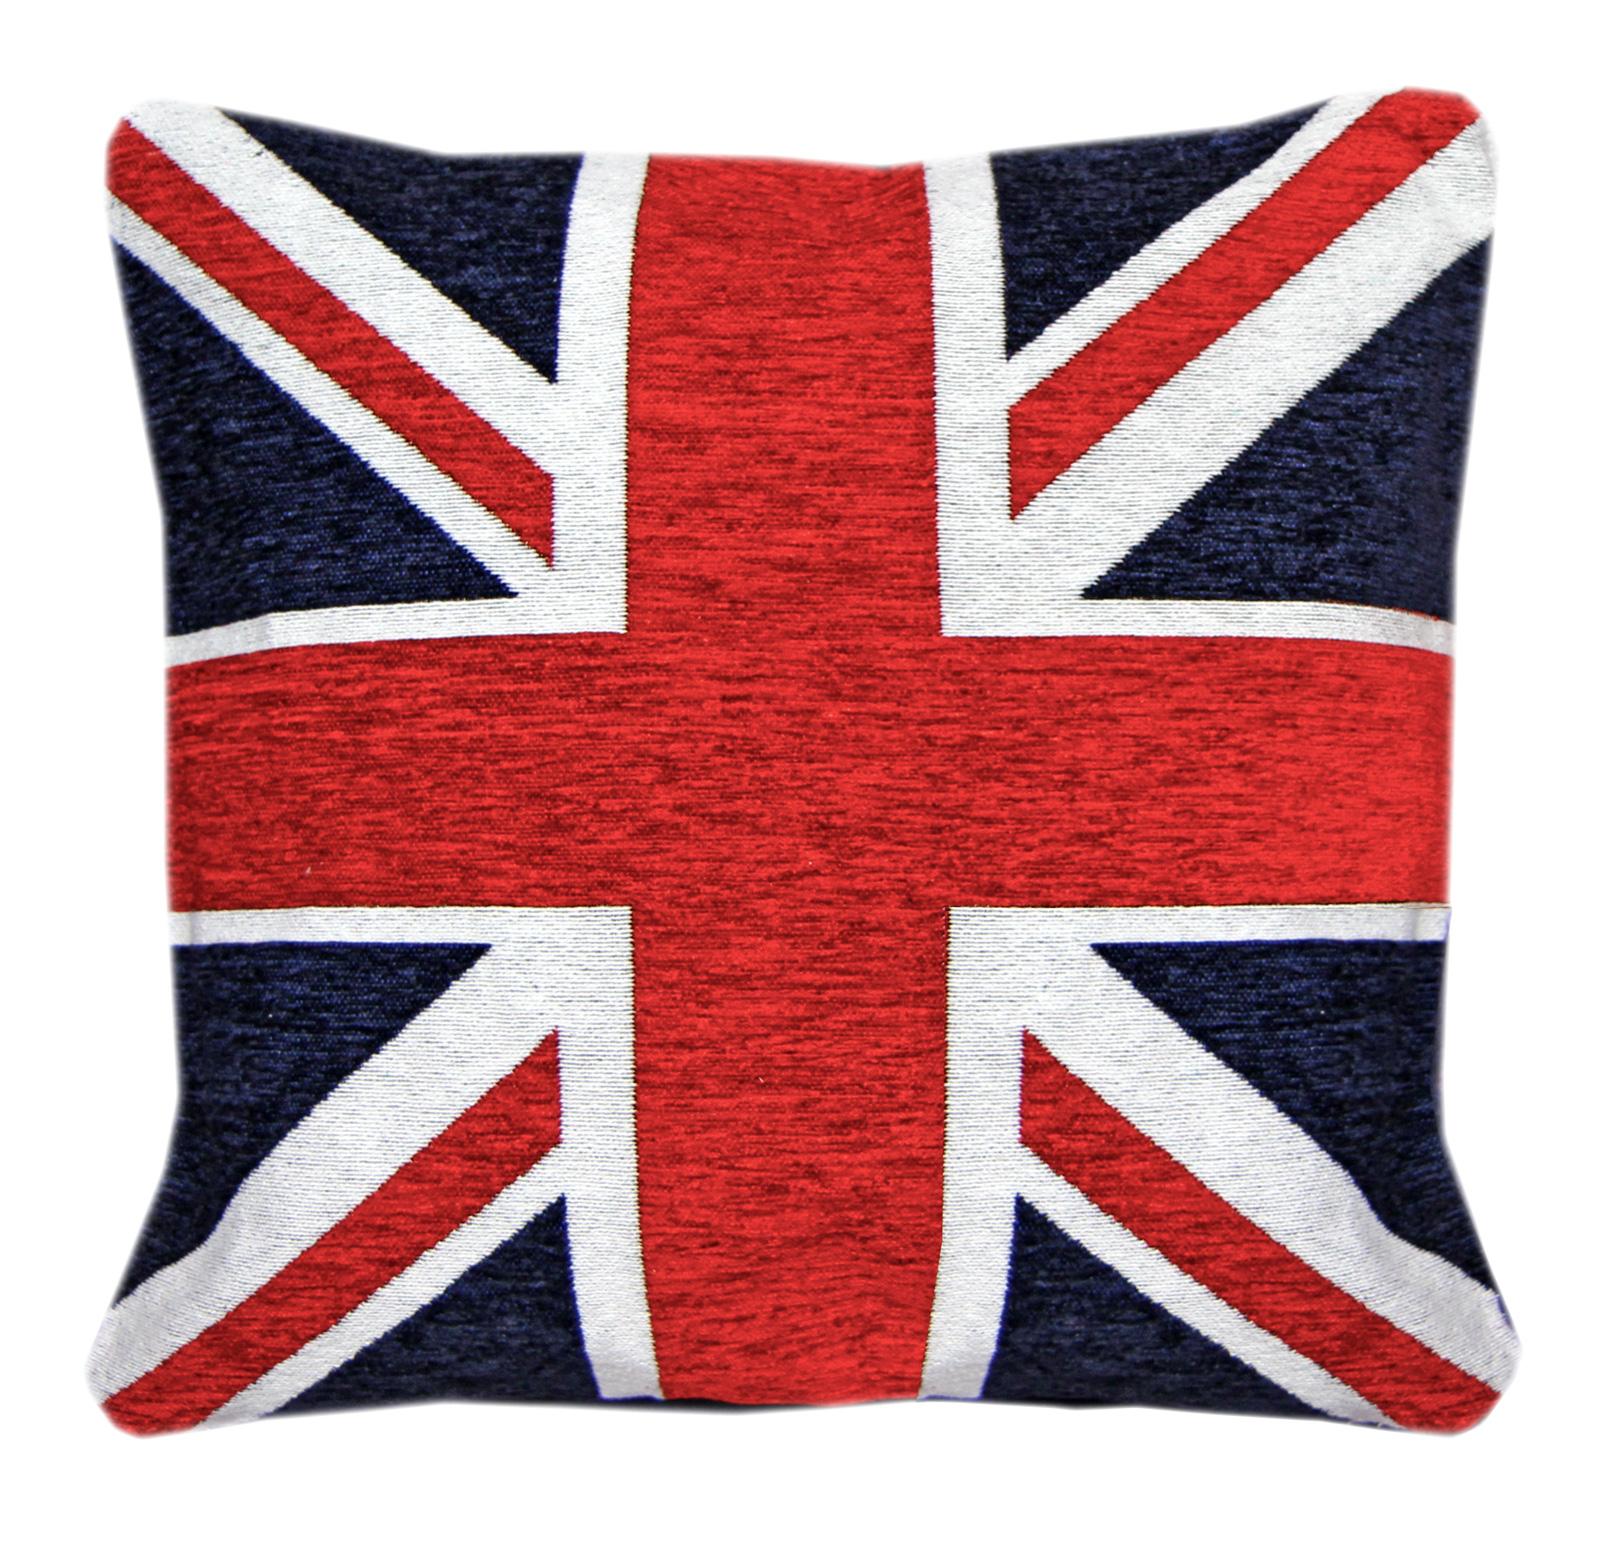 Keep Calm & Union Jack Cotton Chenille Cushion Cover – 18x18